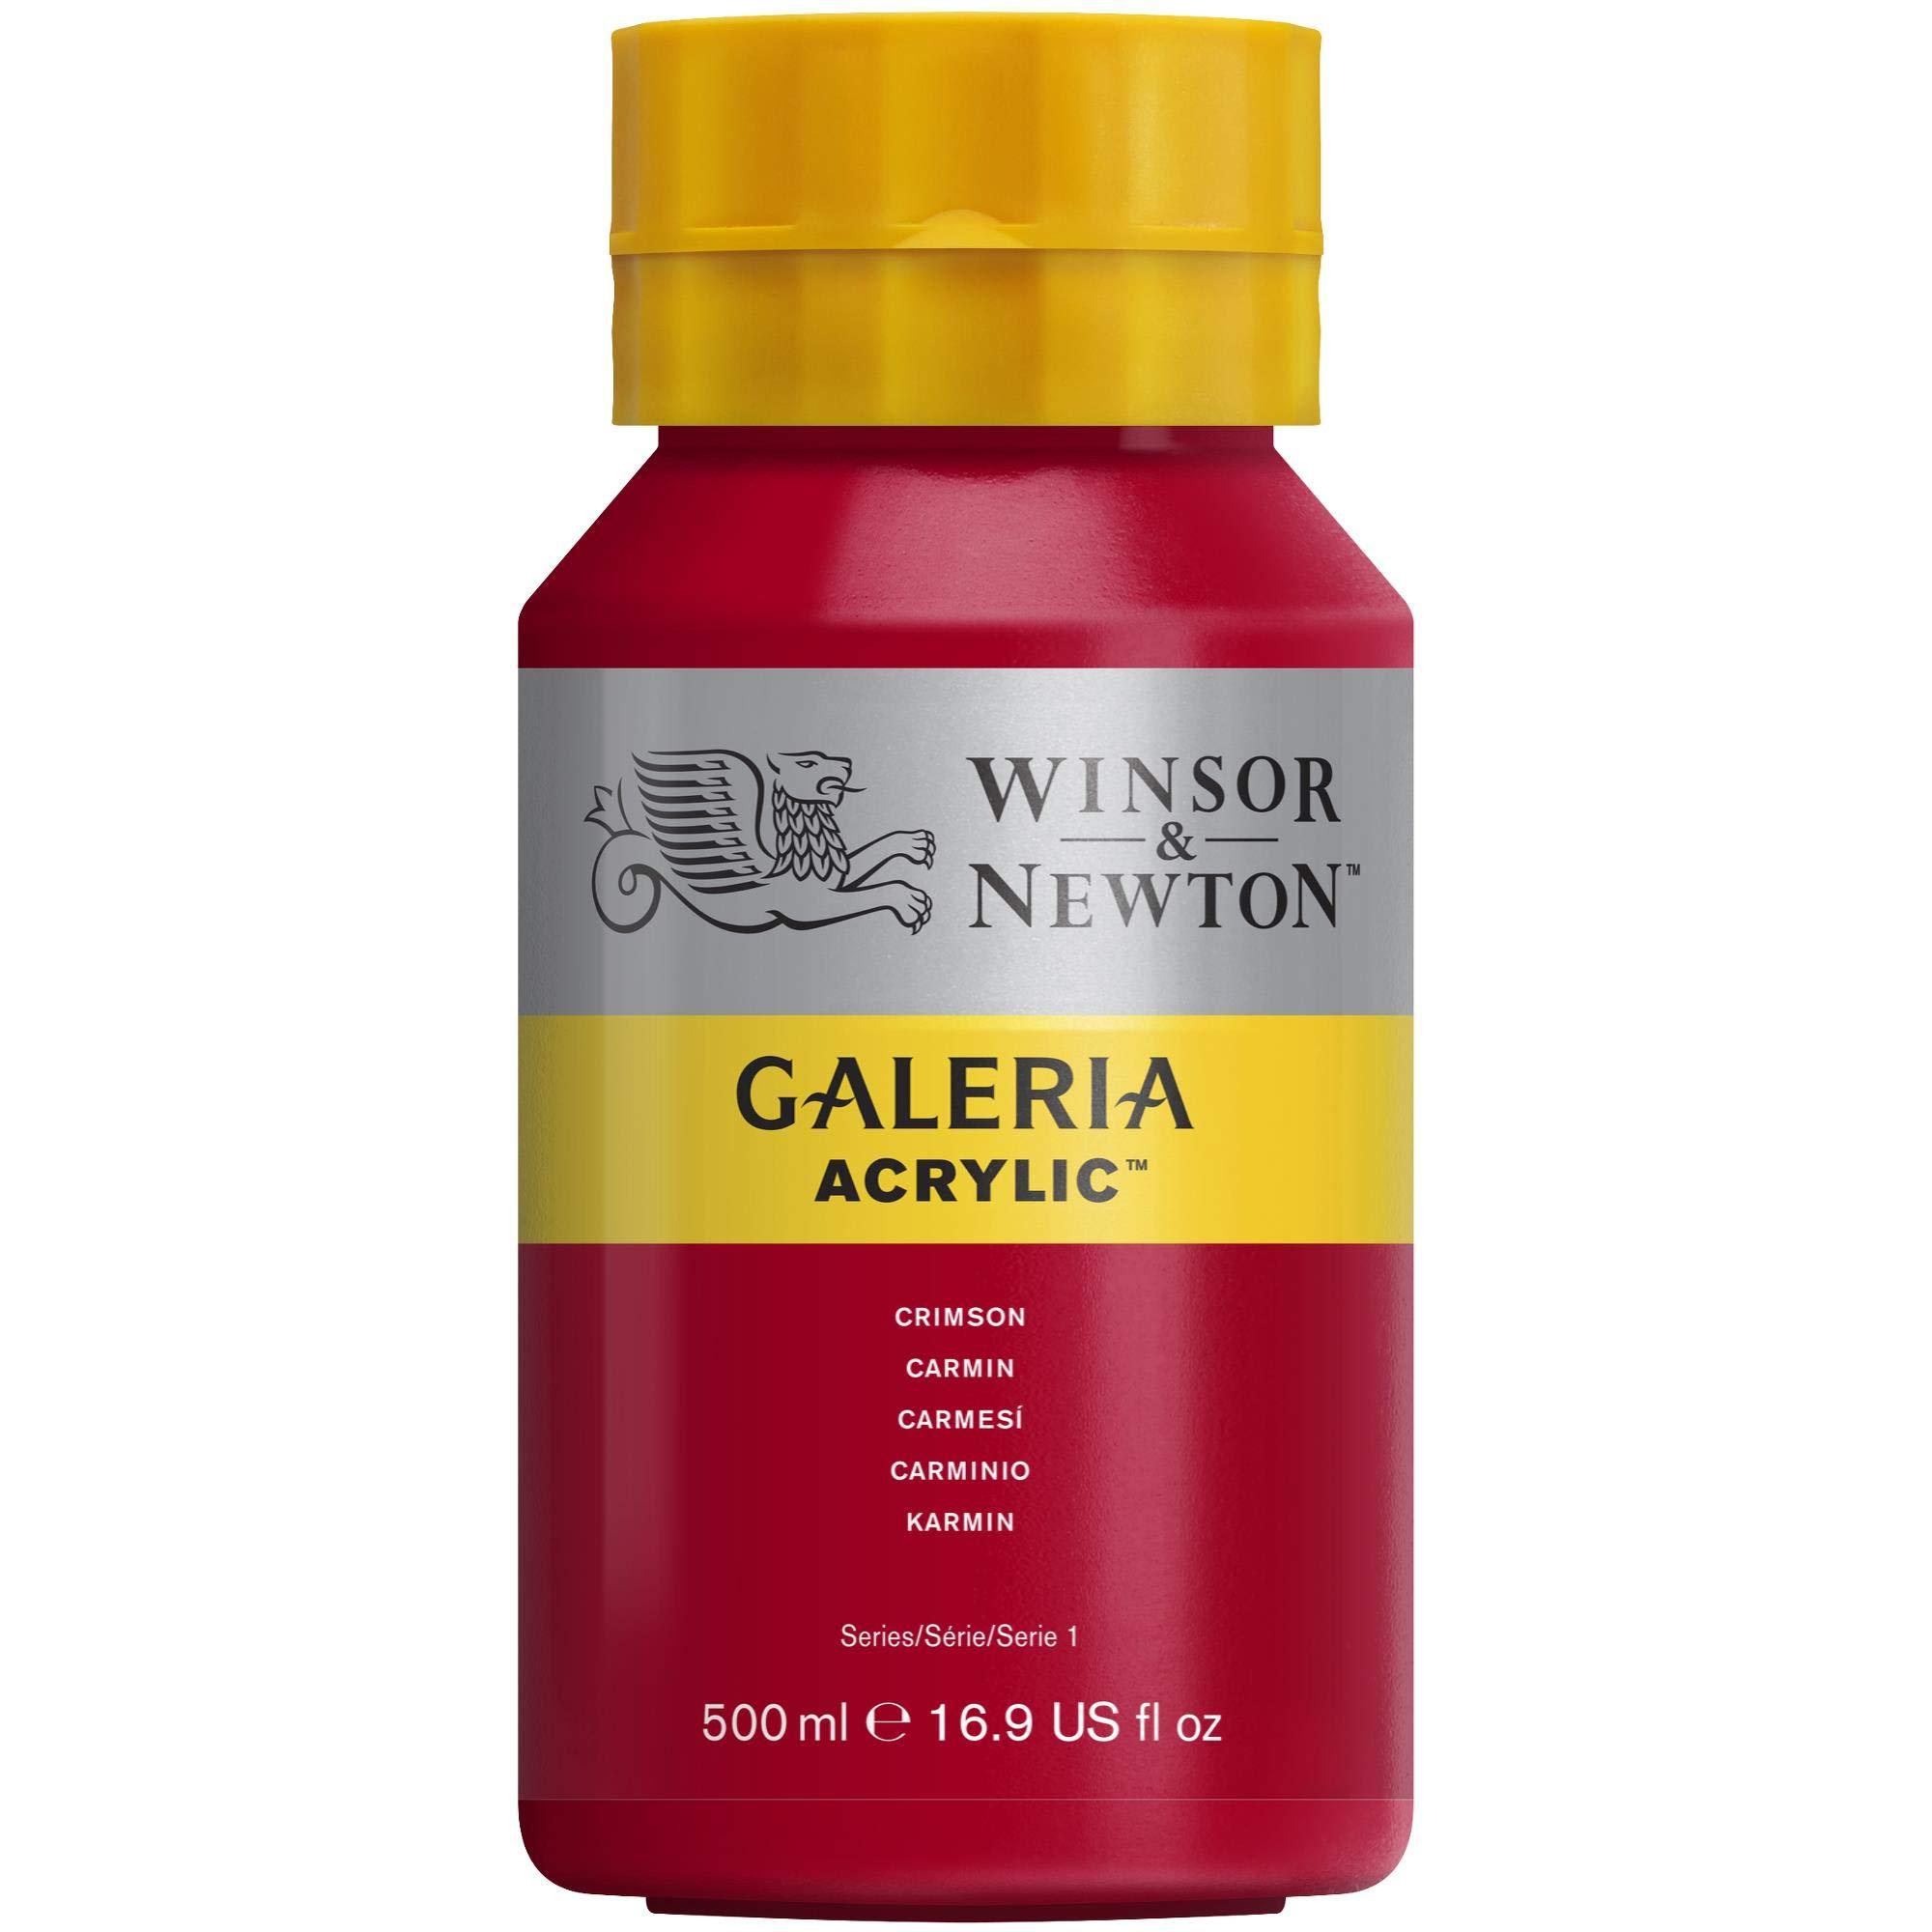 Winsor & Newton Galeria Acrylic Paint, 500ml Bottle, Crimson